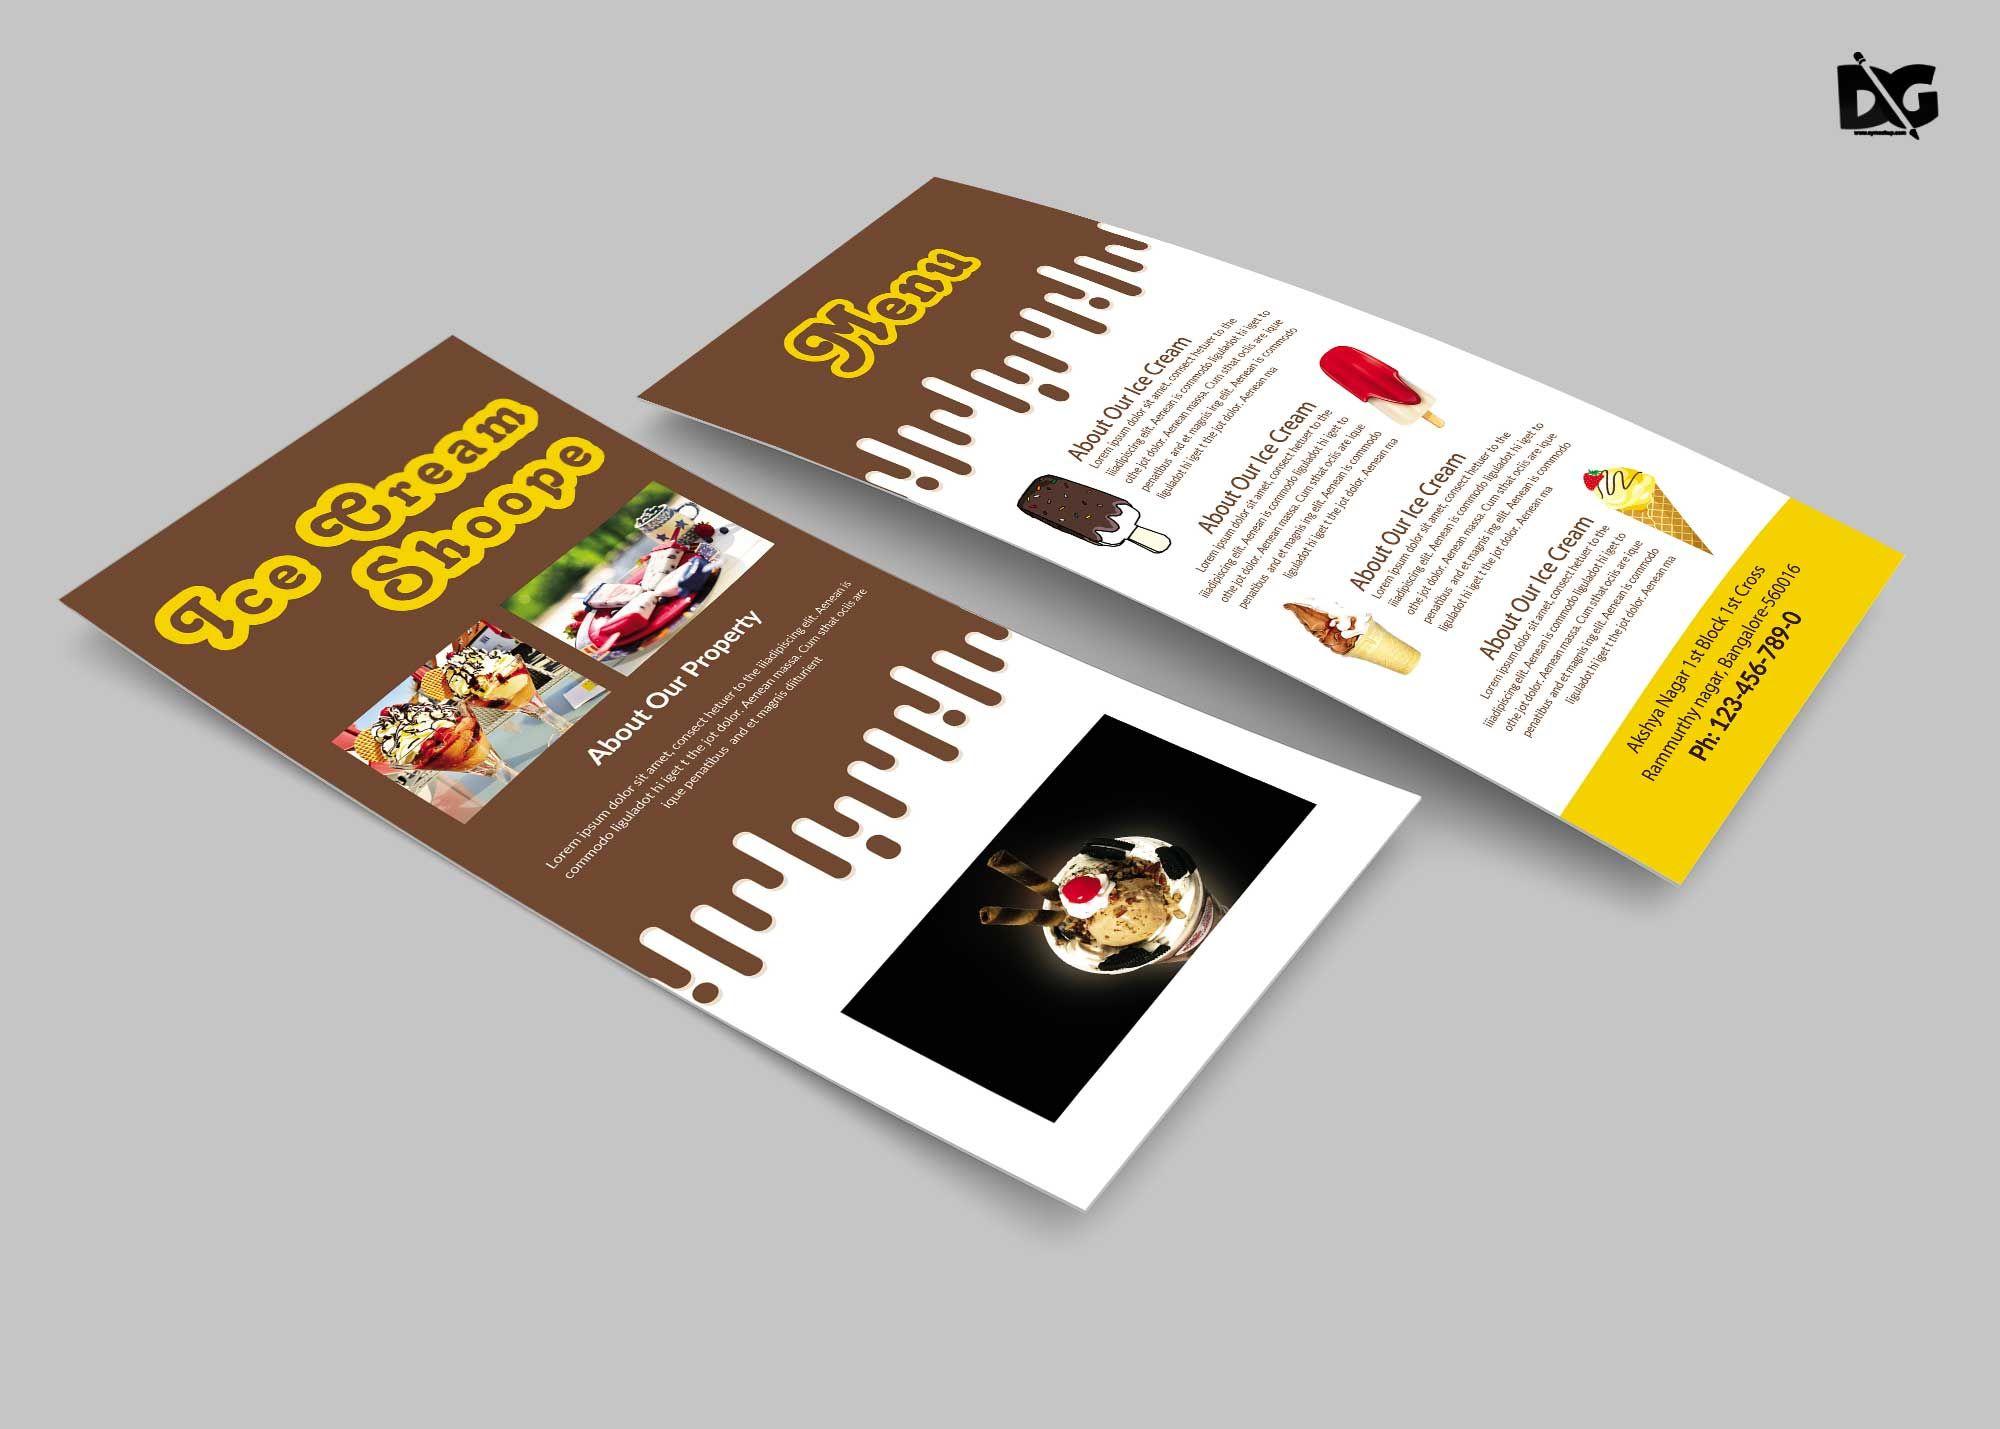 Free Chocolate Ice Cream Rack Card Template Rack Card Templates Rack Card Rack Cards Design